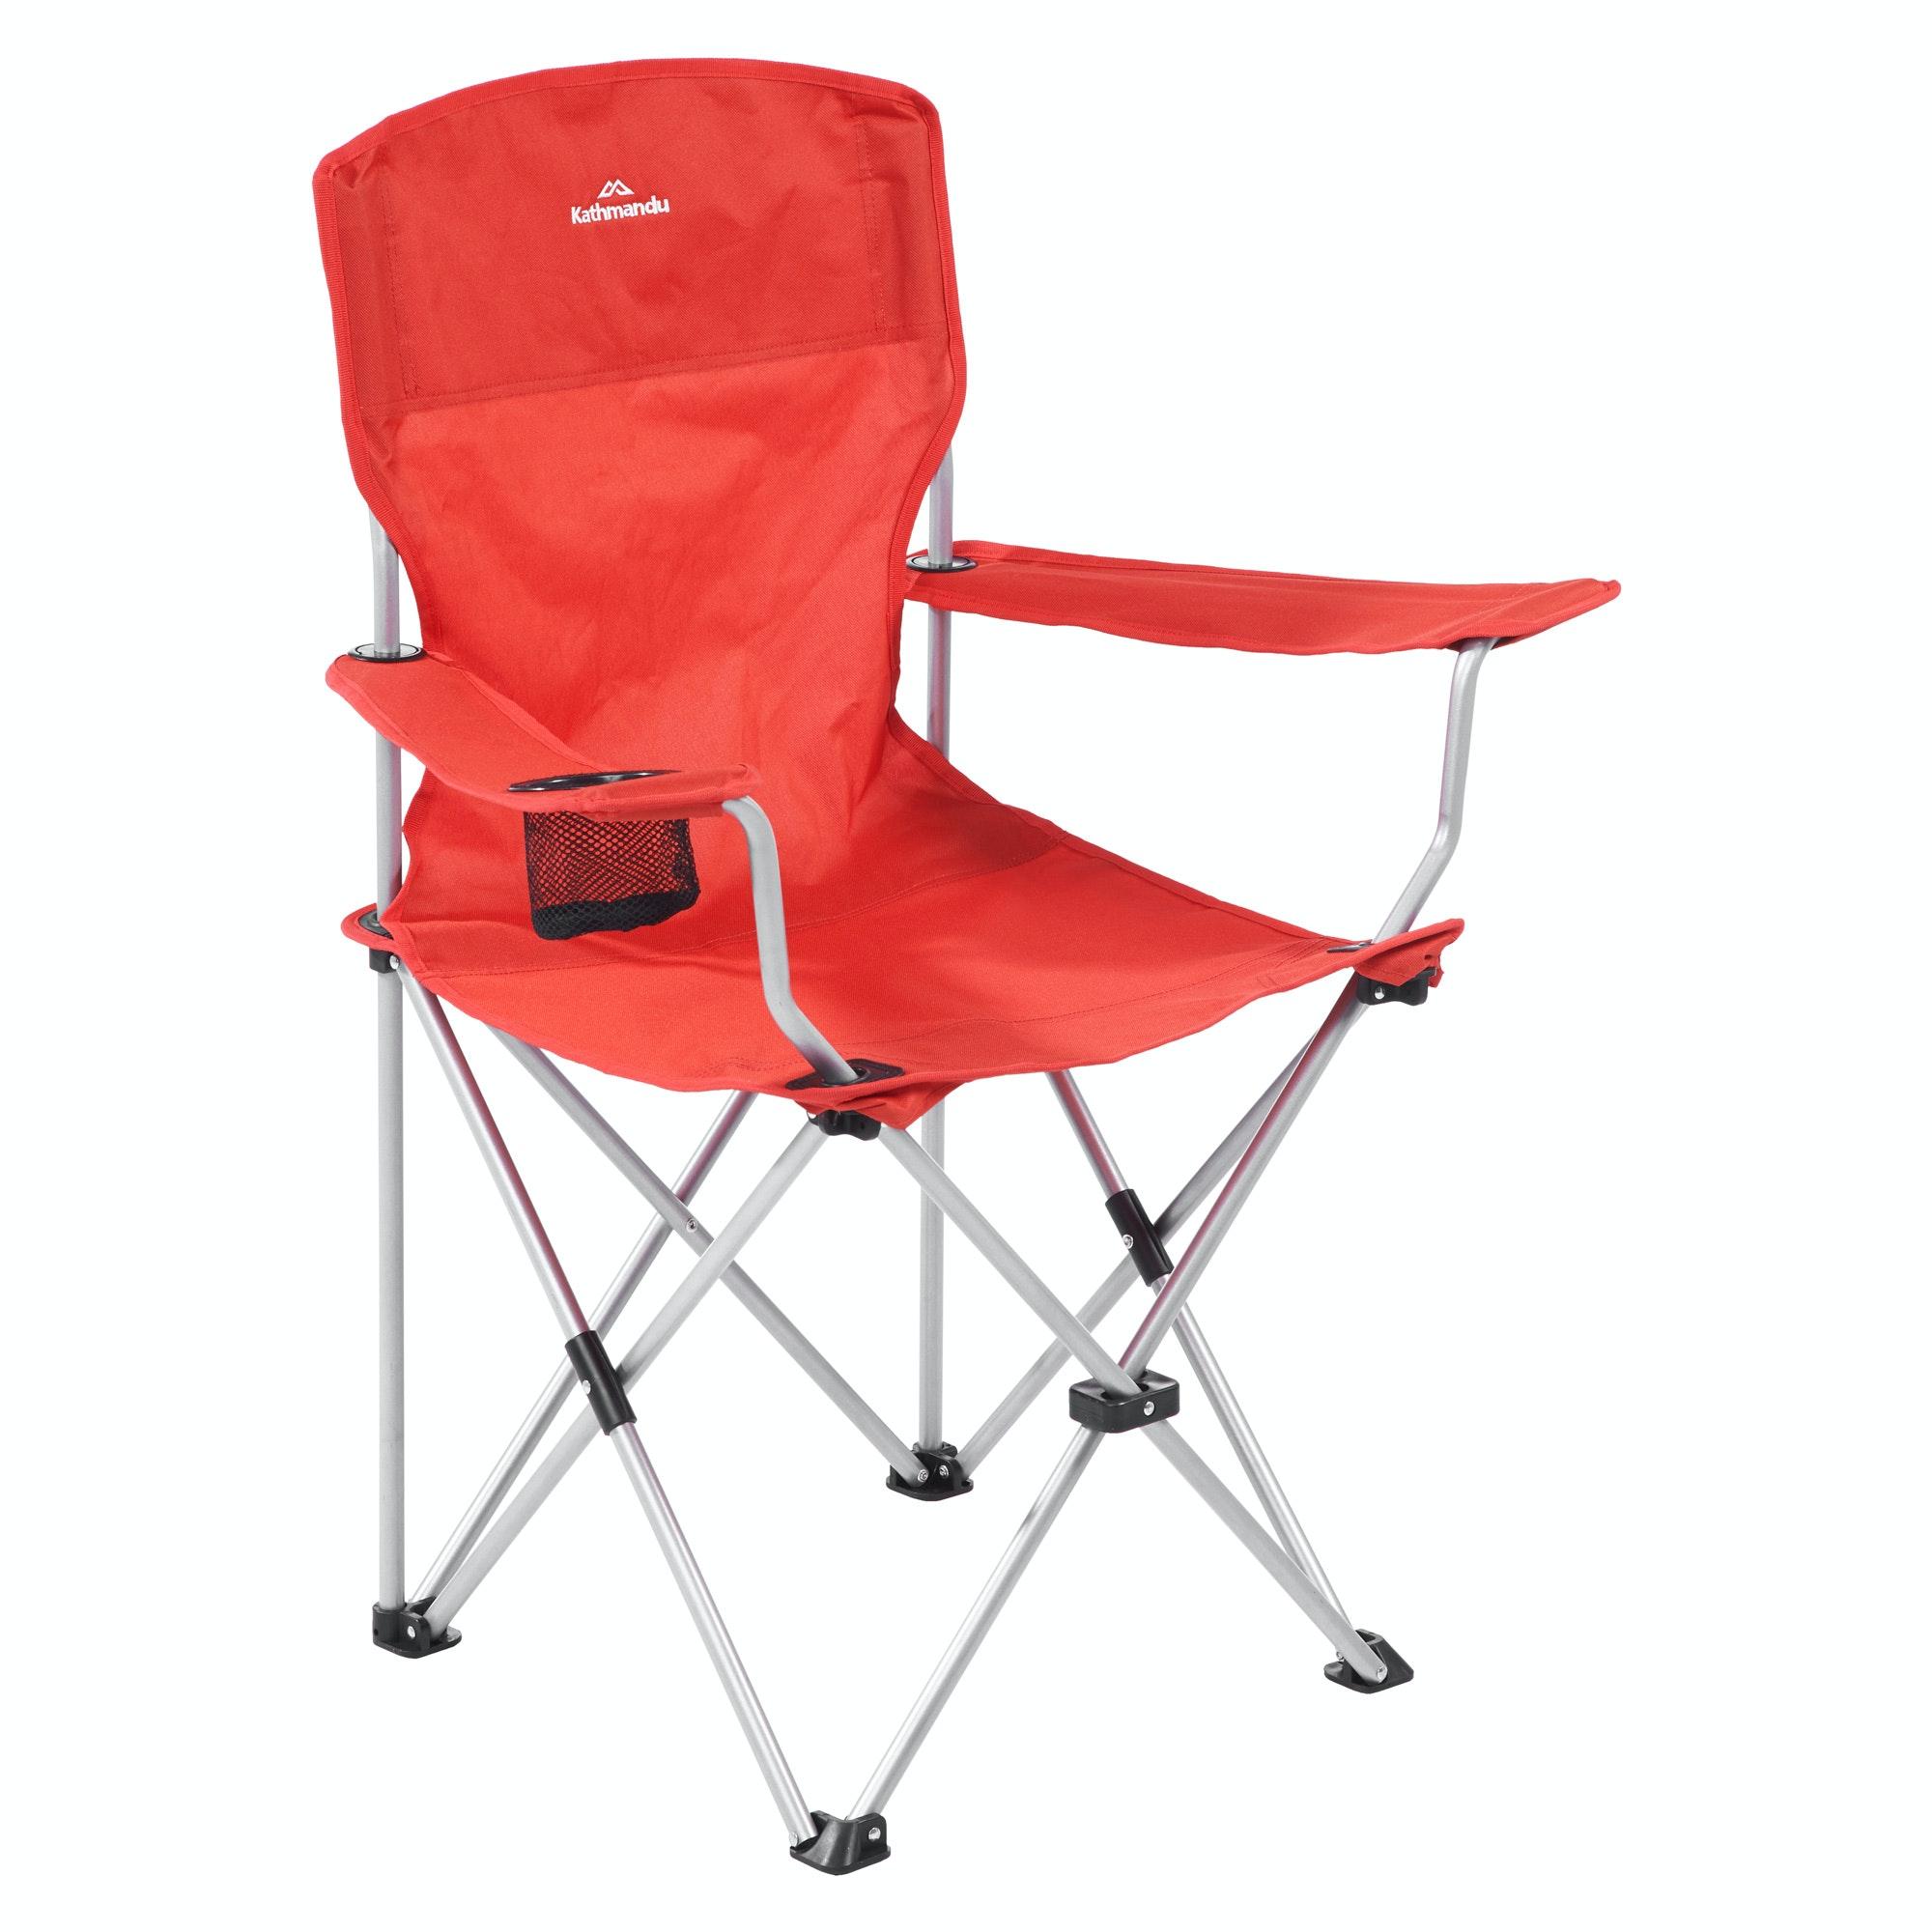 Outdoor Recreation Camping Furniture Australia